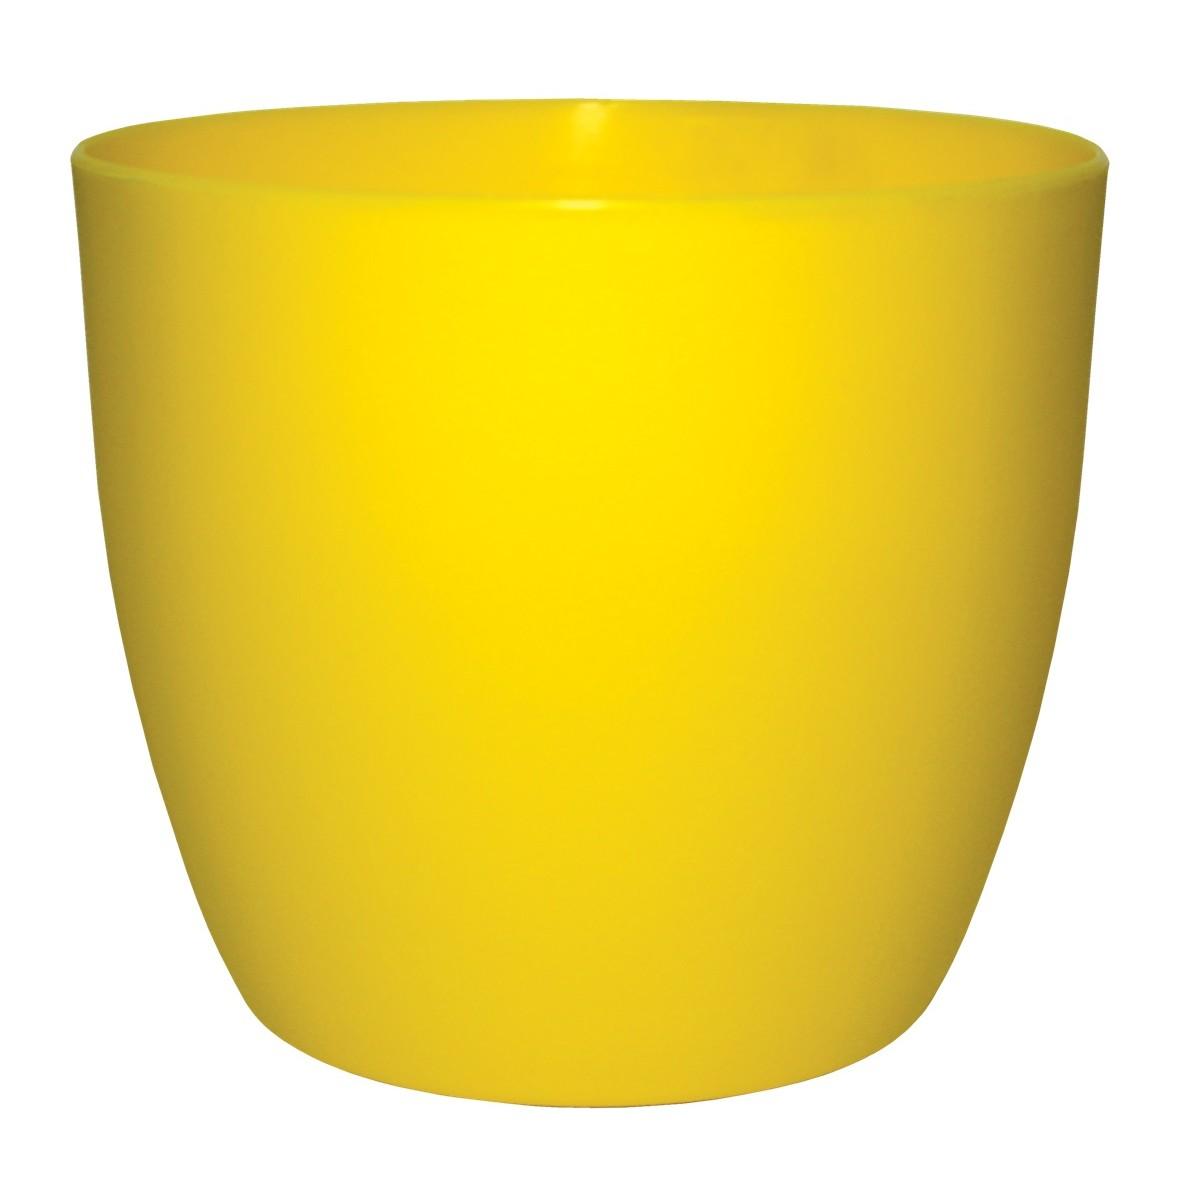 Vaso para Plantas Amarelo Redondo 15 cm Musique Plastico - Japi